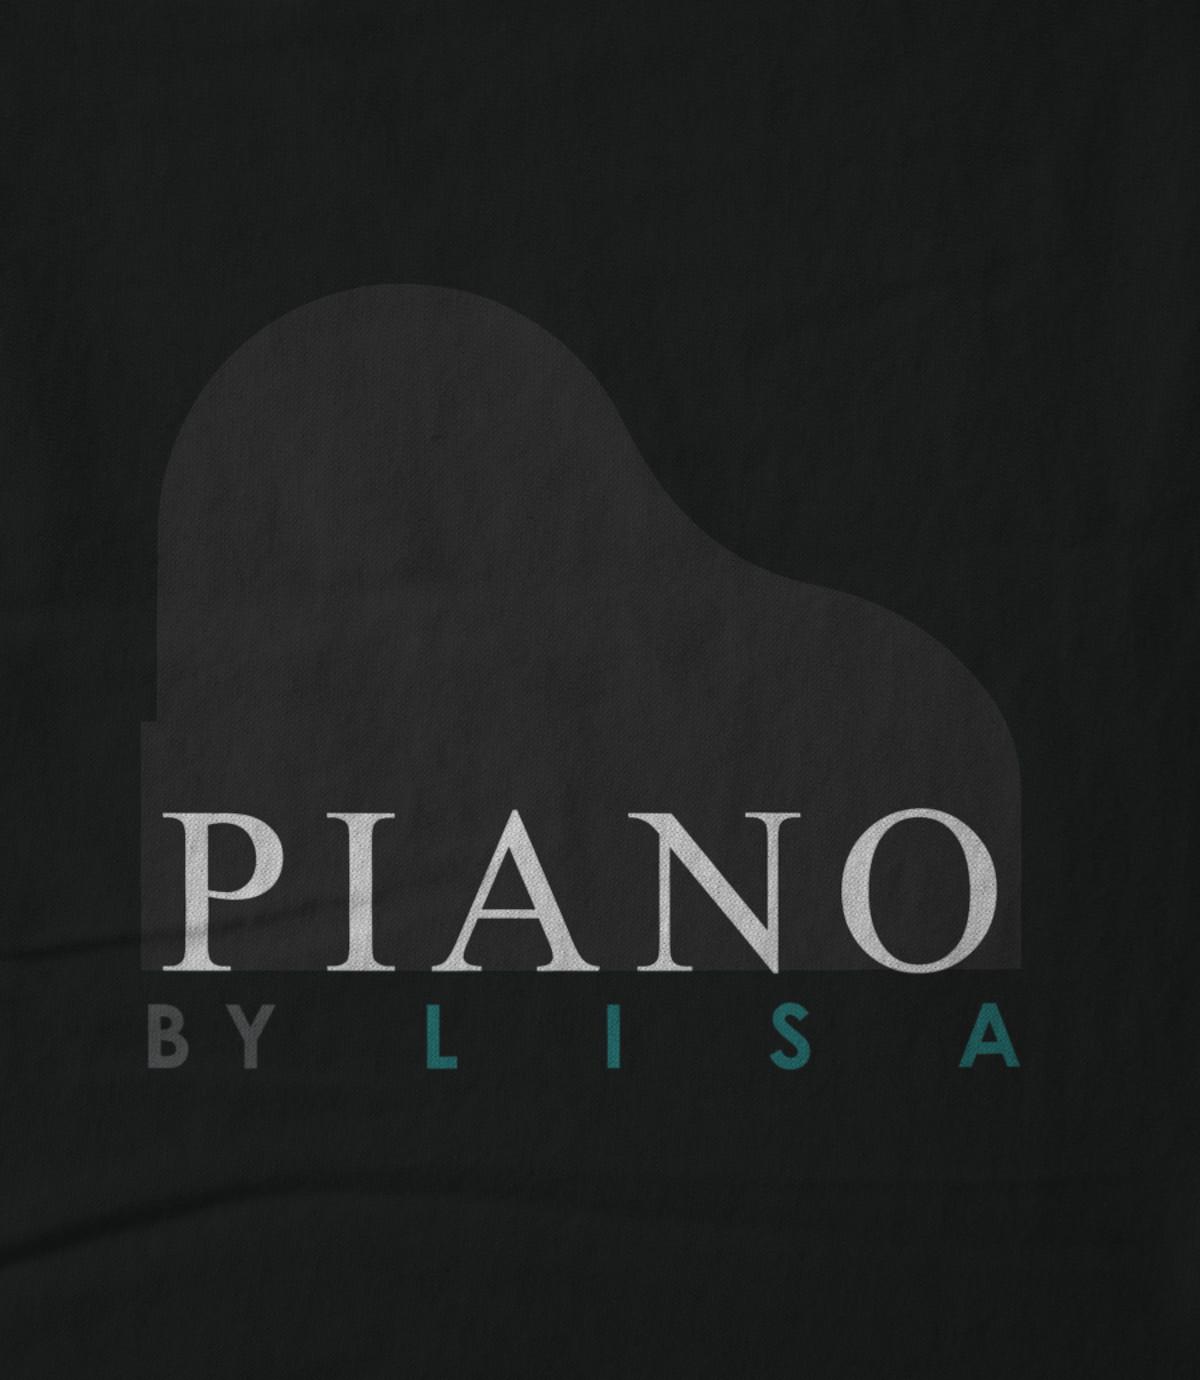 Piano by lisa t shirt white  1523830915